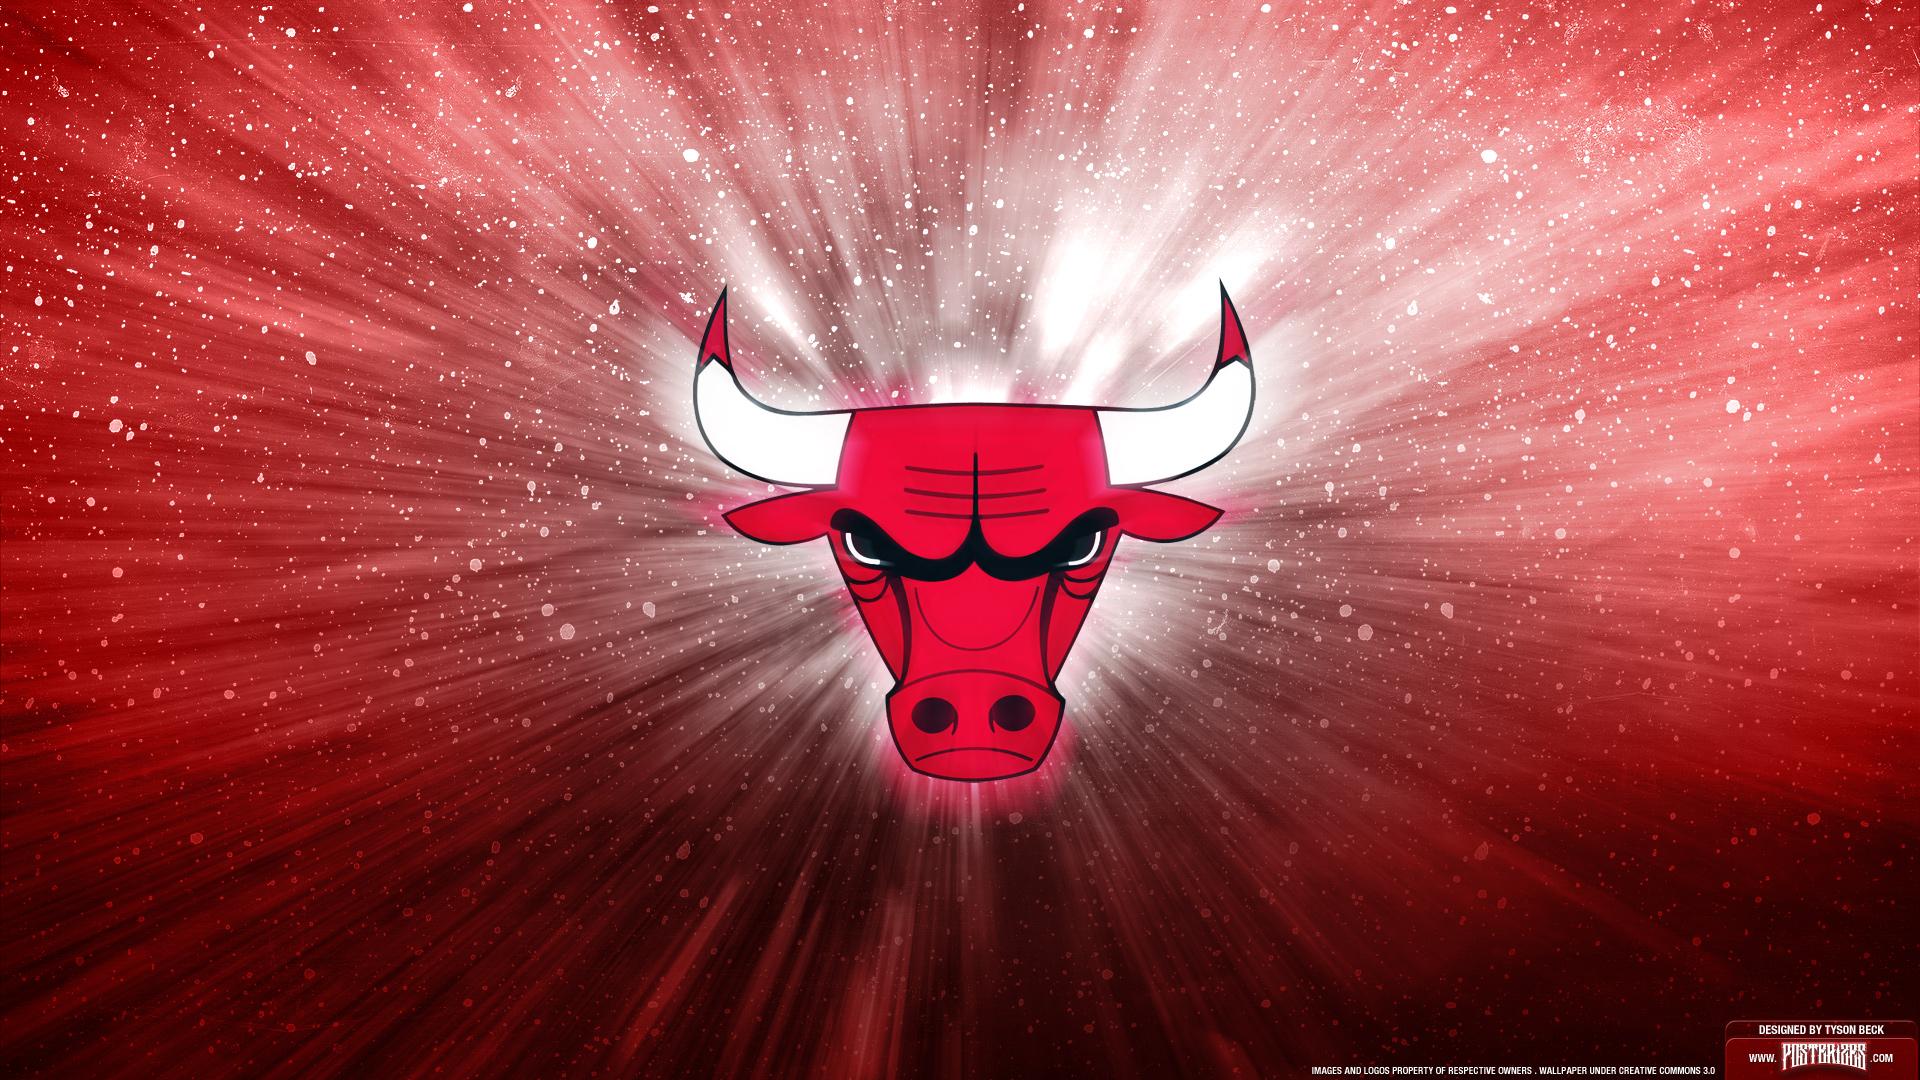 Download Chicago Bulls Logo Posterizes Nba Free Wallpaper ... src